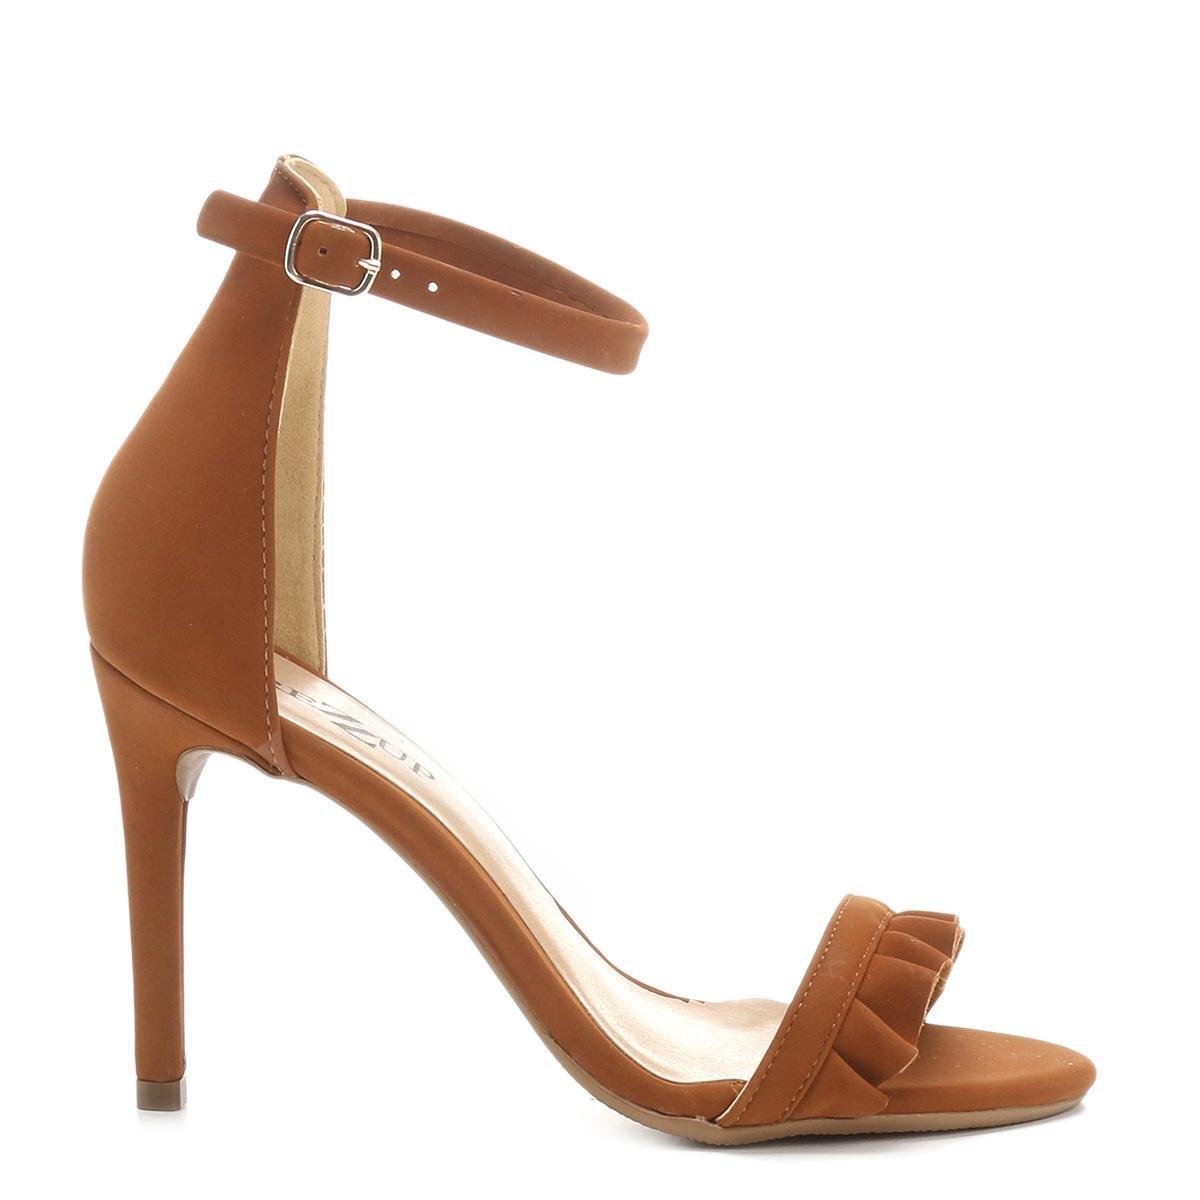 192de7f804 sandália drezzup salto fino babados feminina. Carregando zoom.